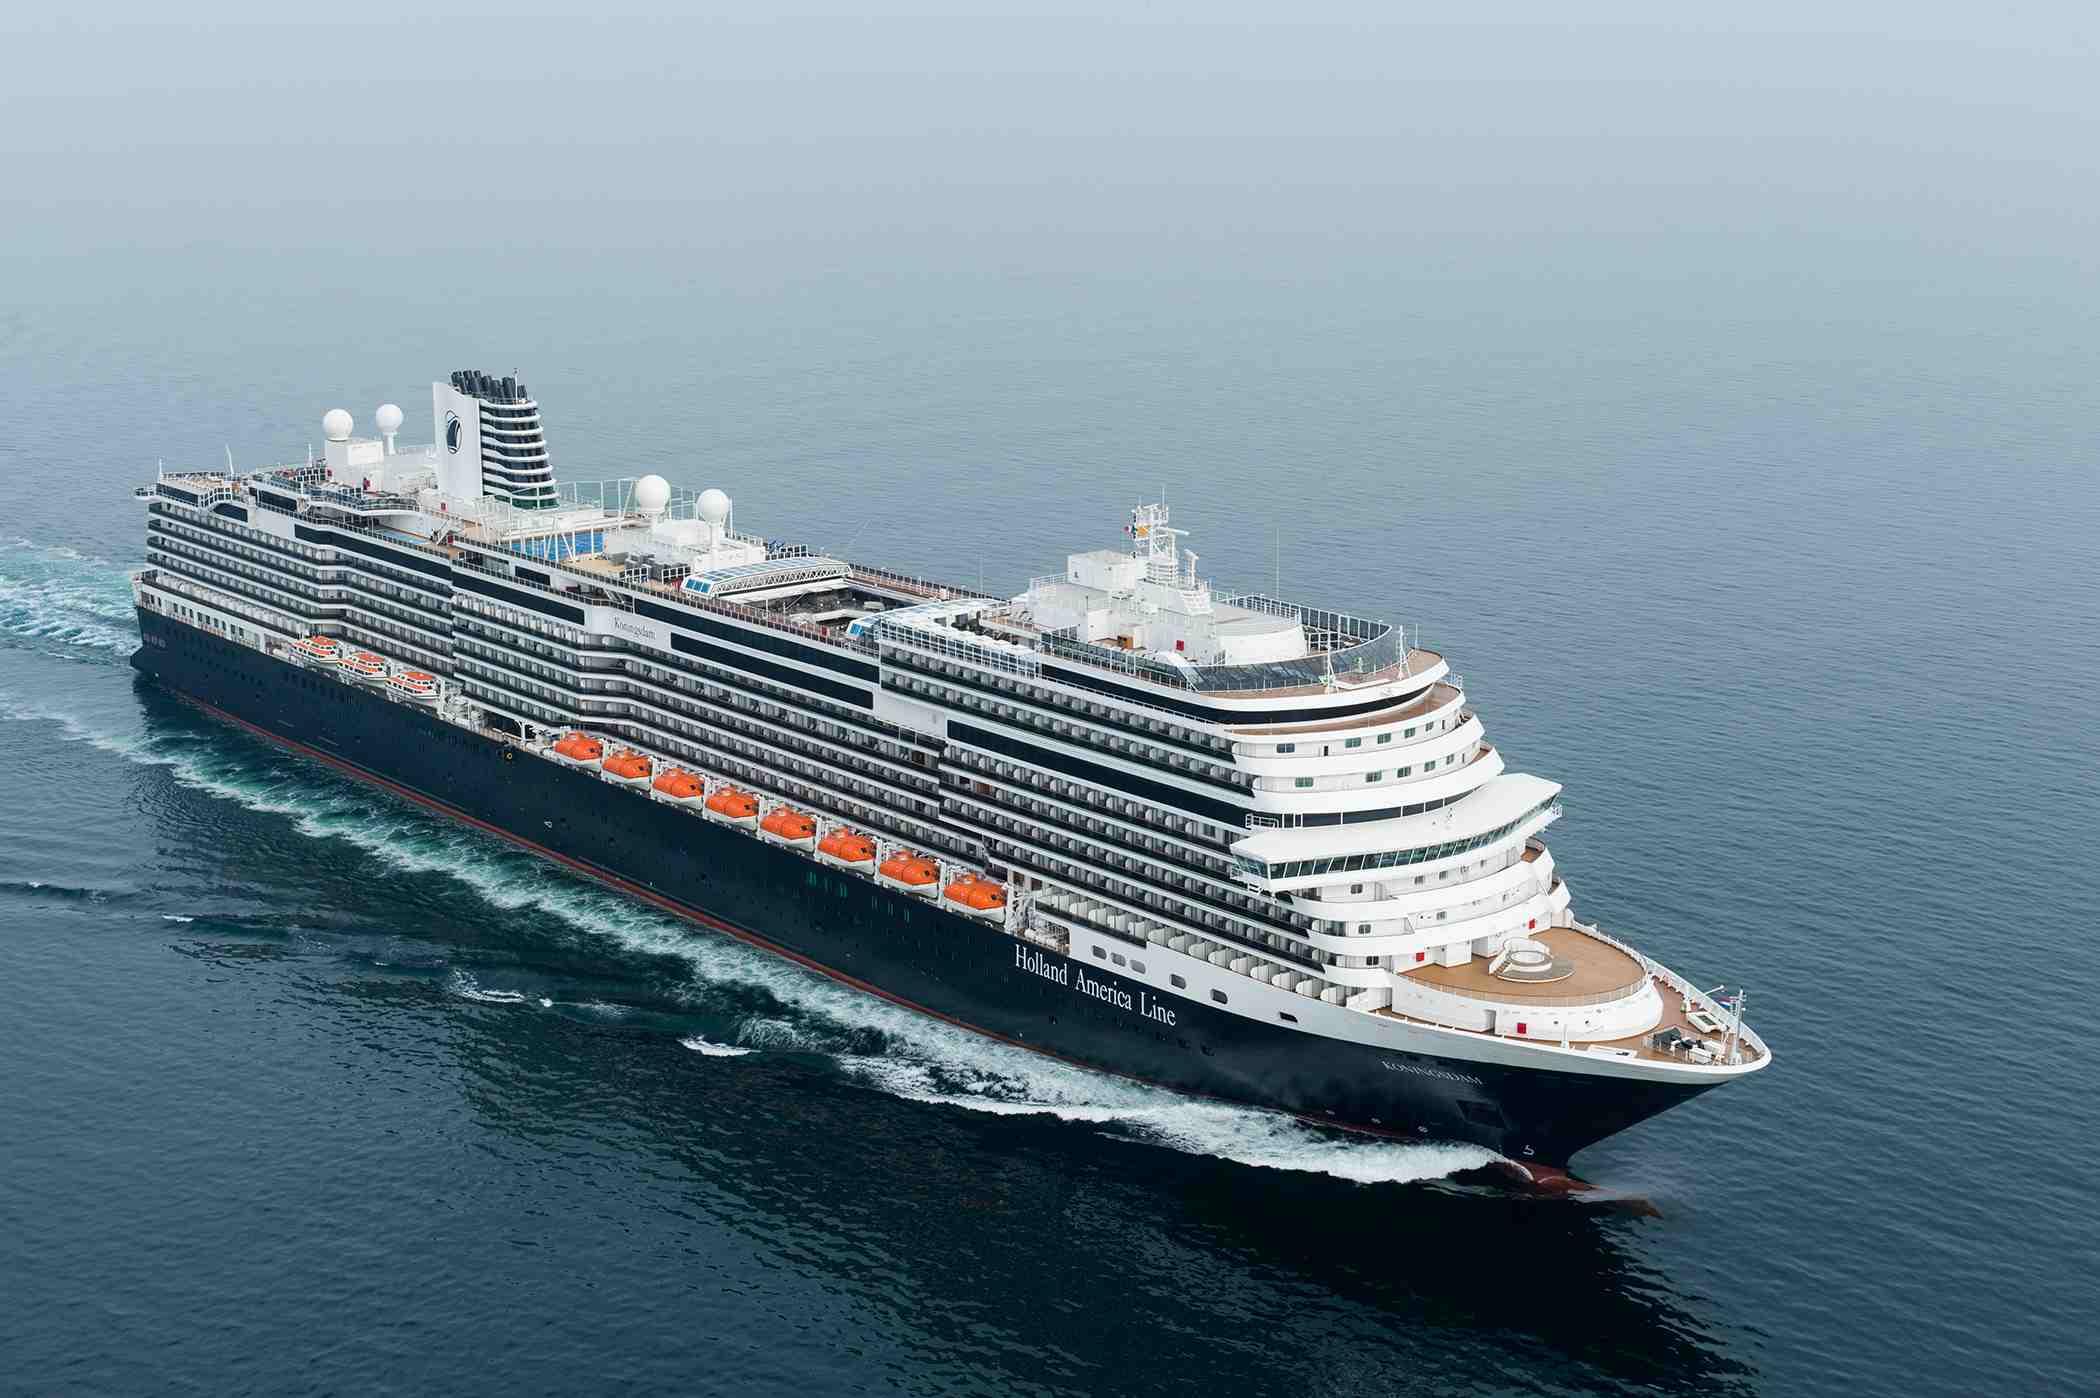 Holland America Koningsdam cruise ship at sea